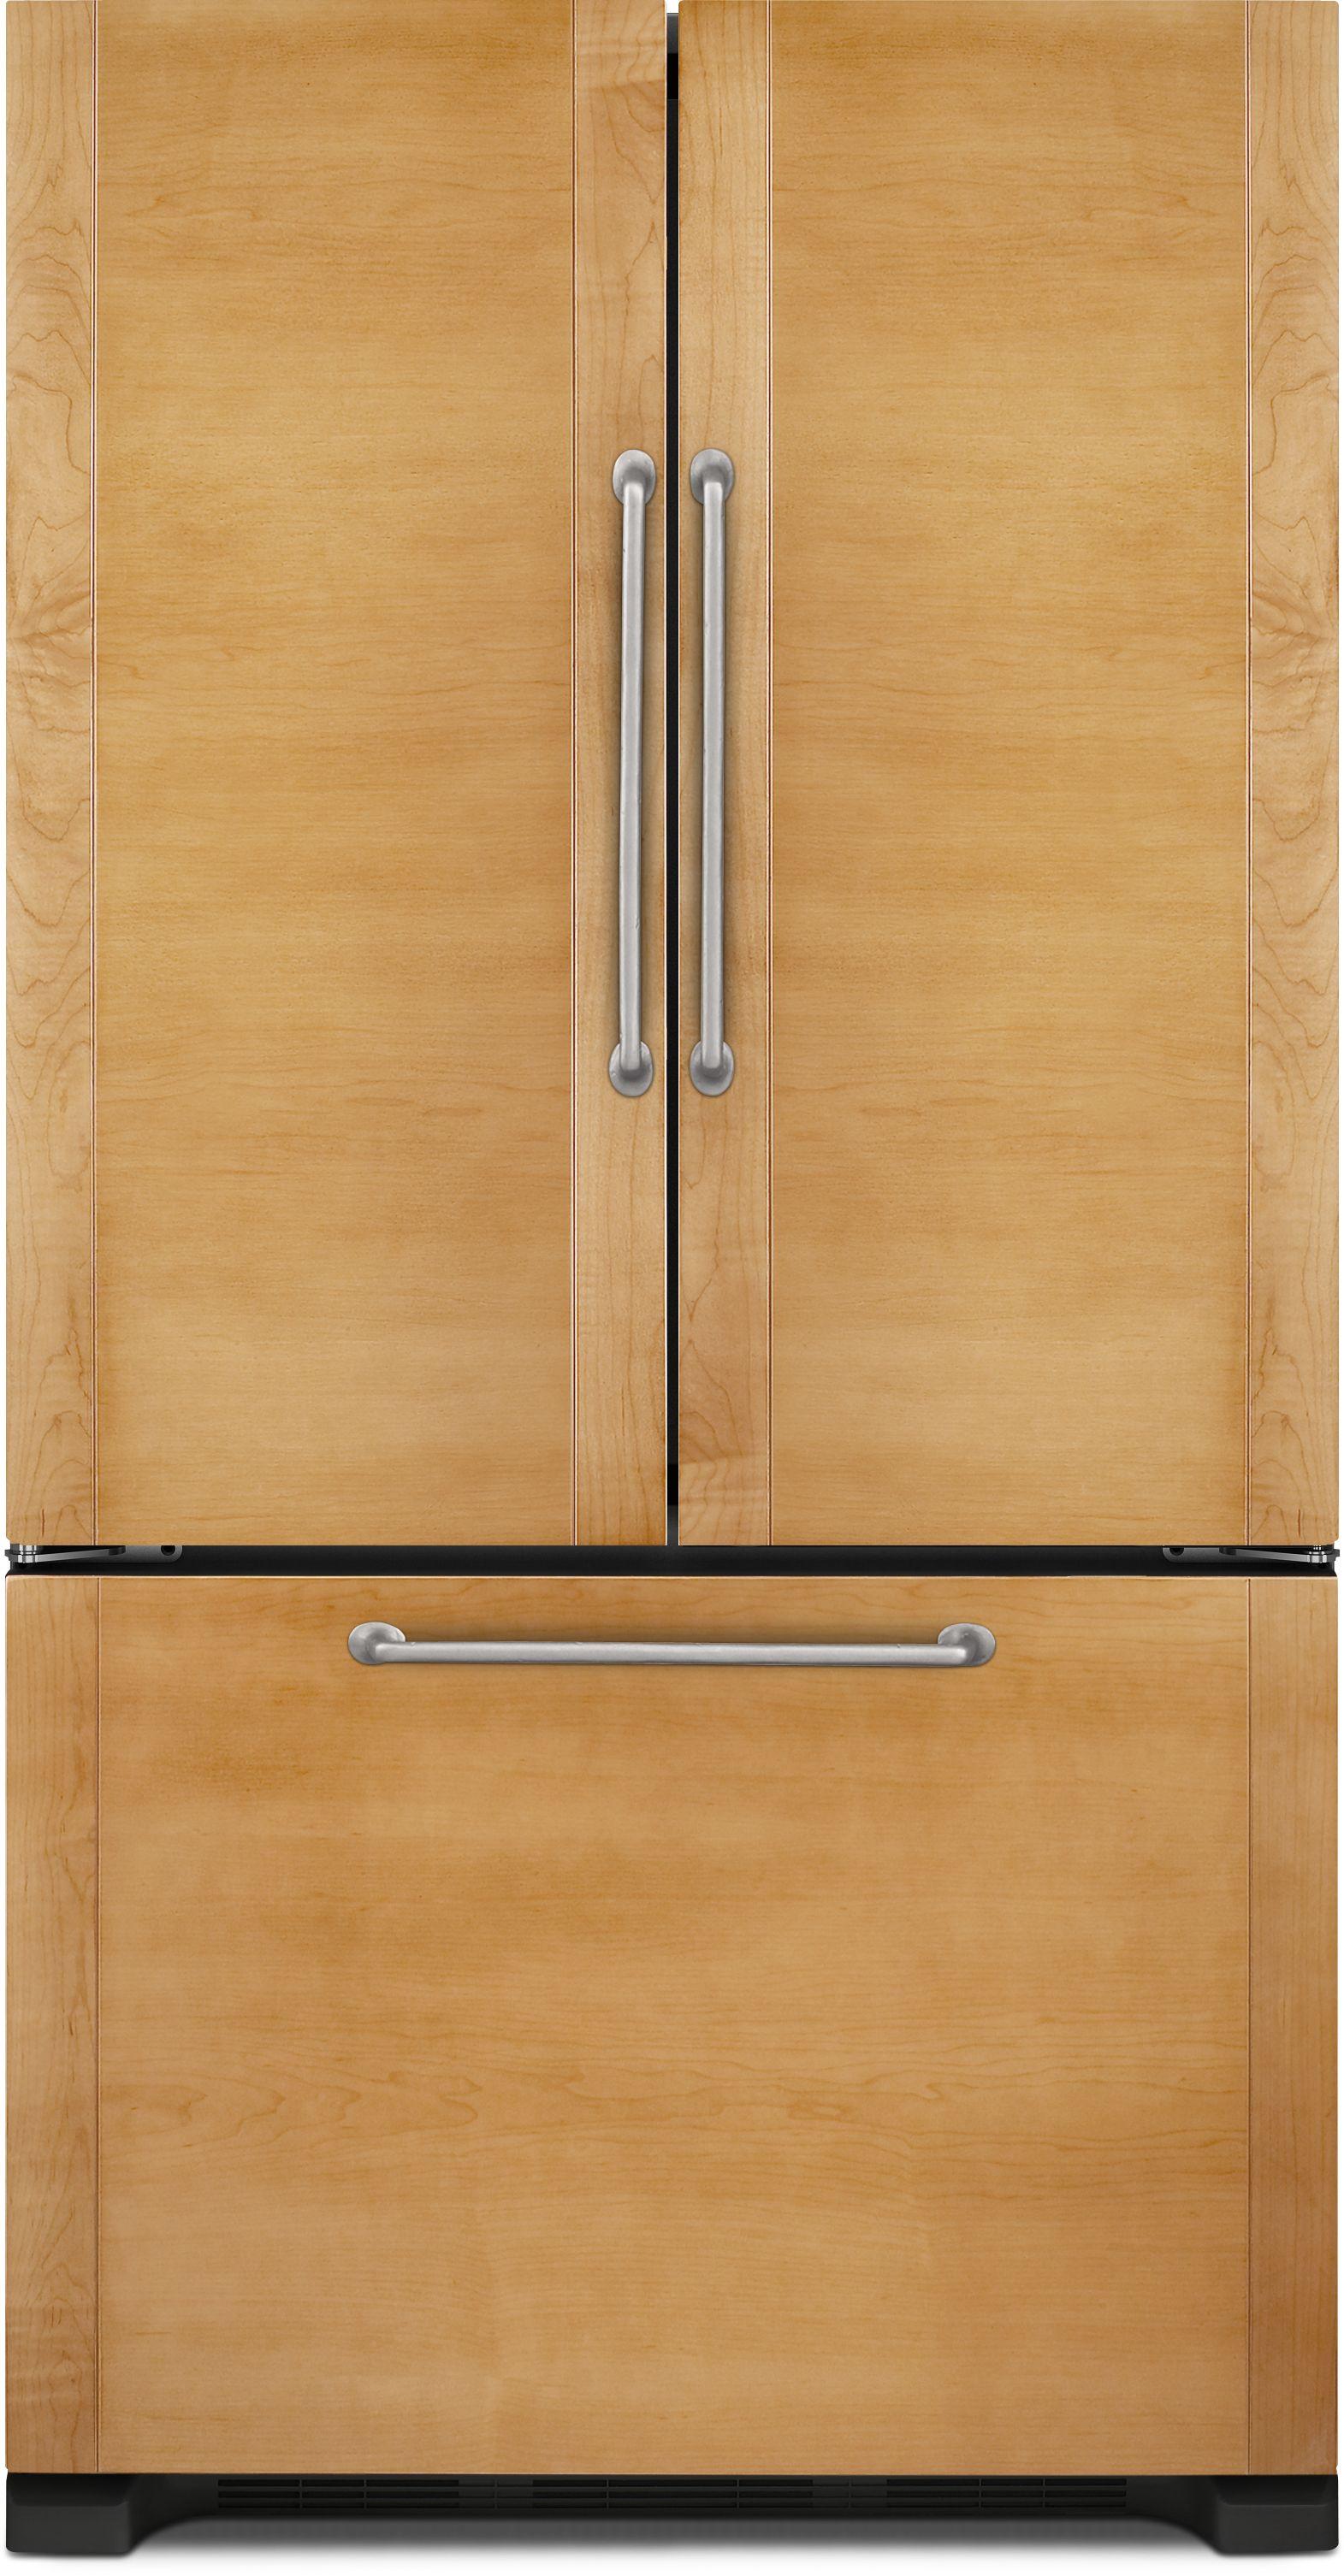 Jenn Air 219 Cu Ft Counter Depth French Door Refrigerator Panel